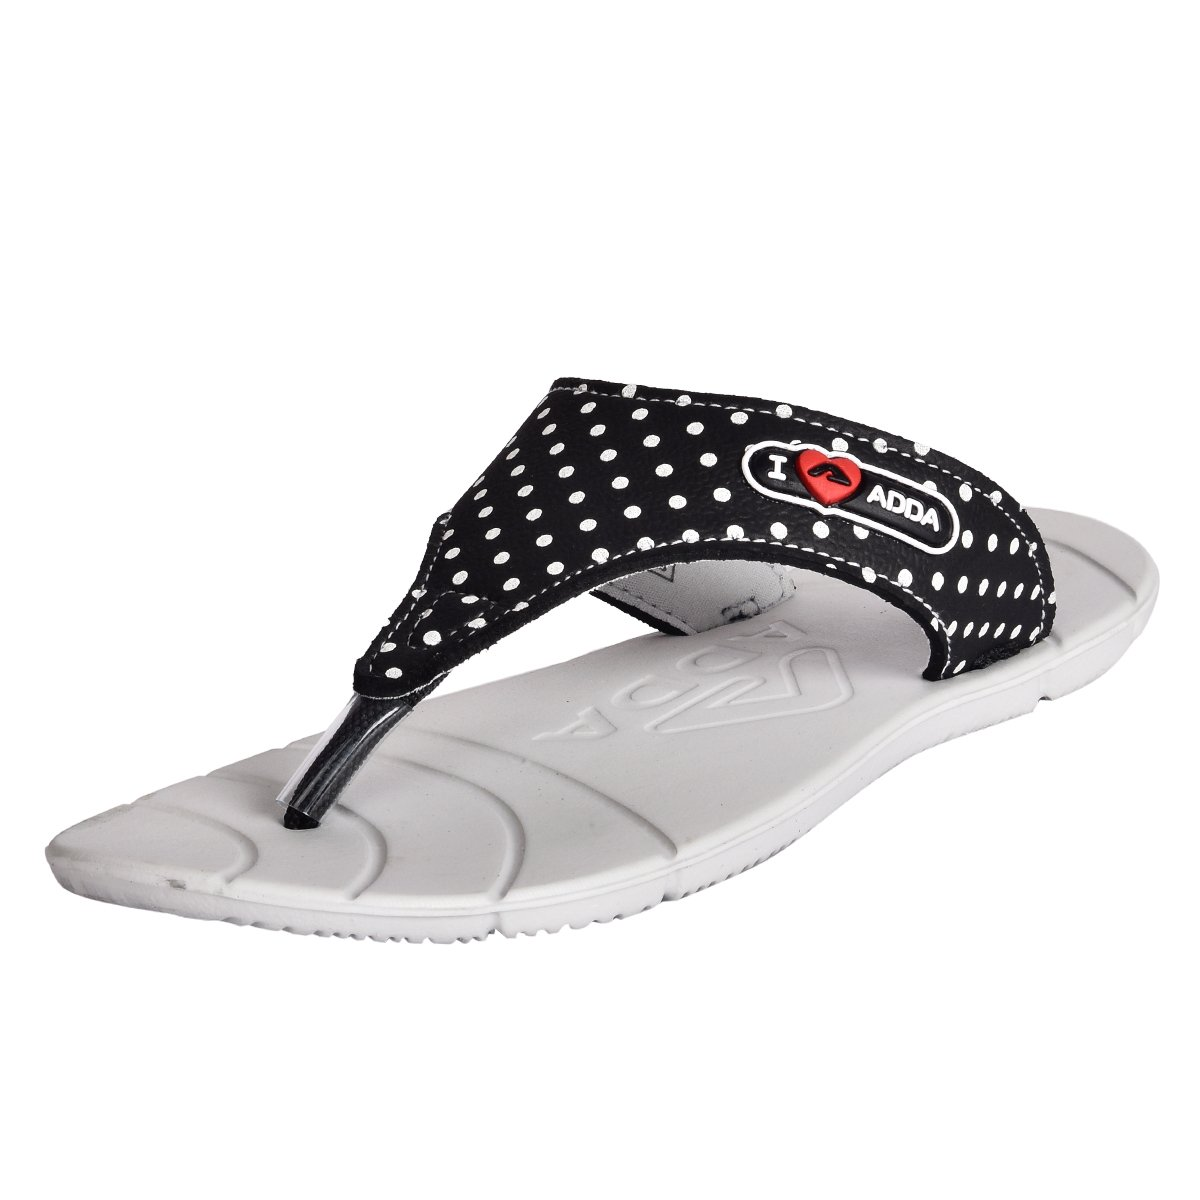 Black EVA Slippers (Awsome) 6UK